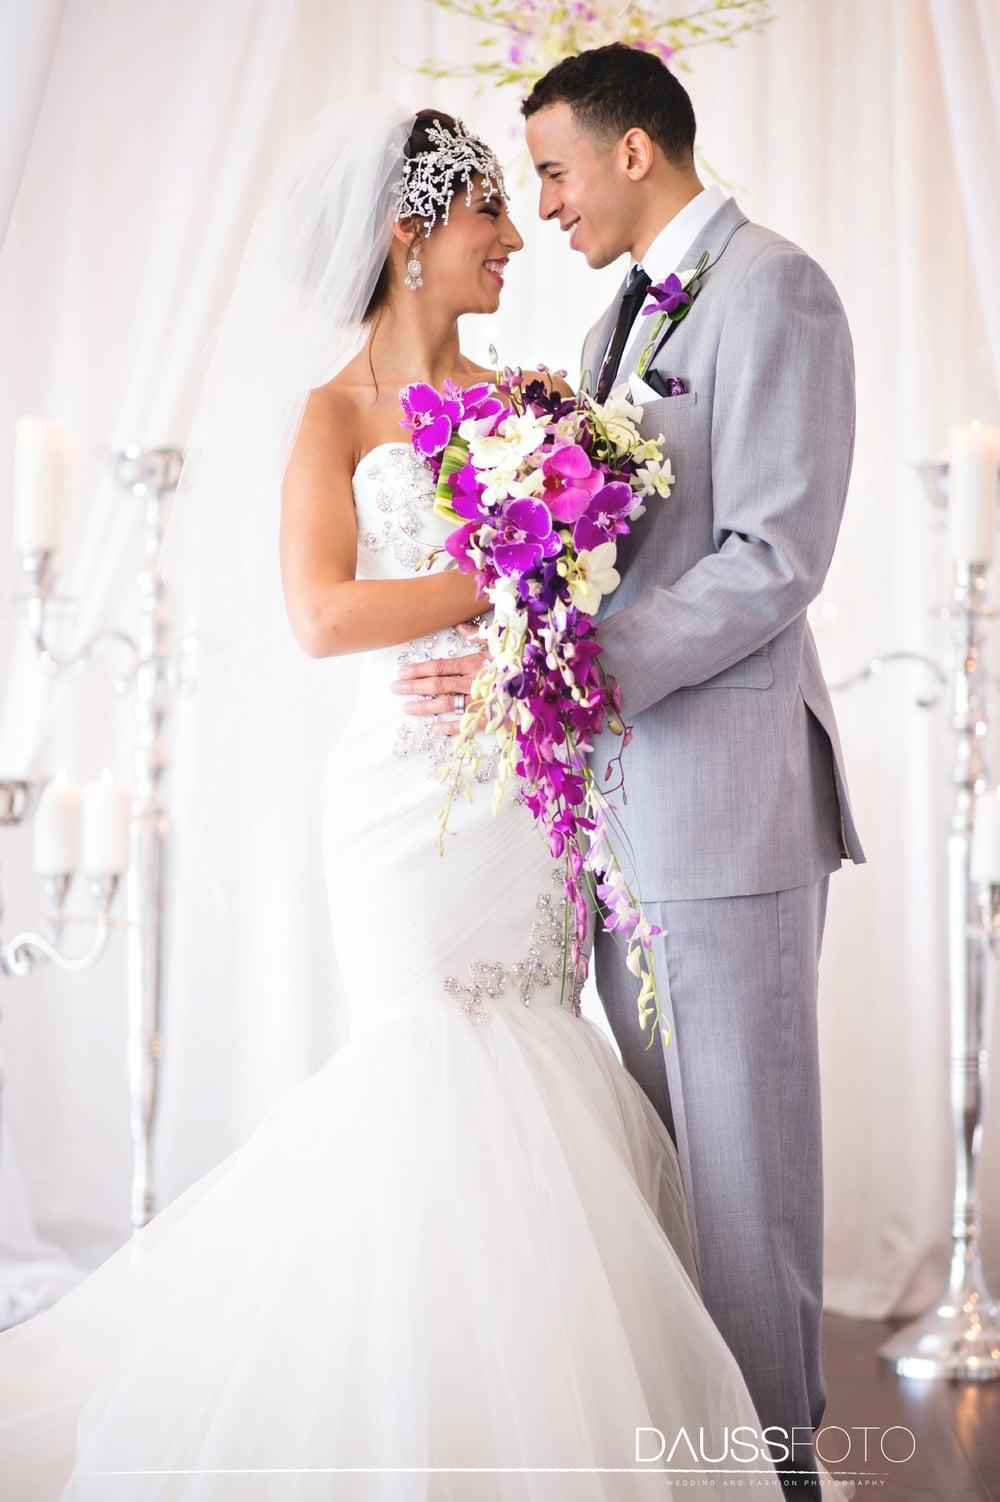 DaussFOTO_20150721_037_Indiana Wedding Photographer.jpg